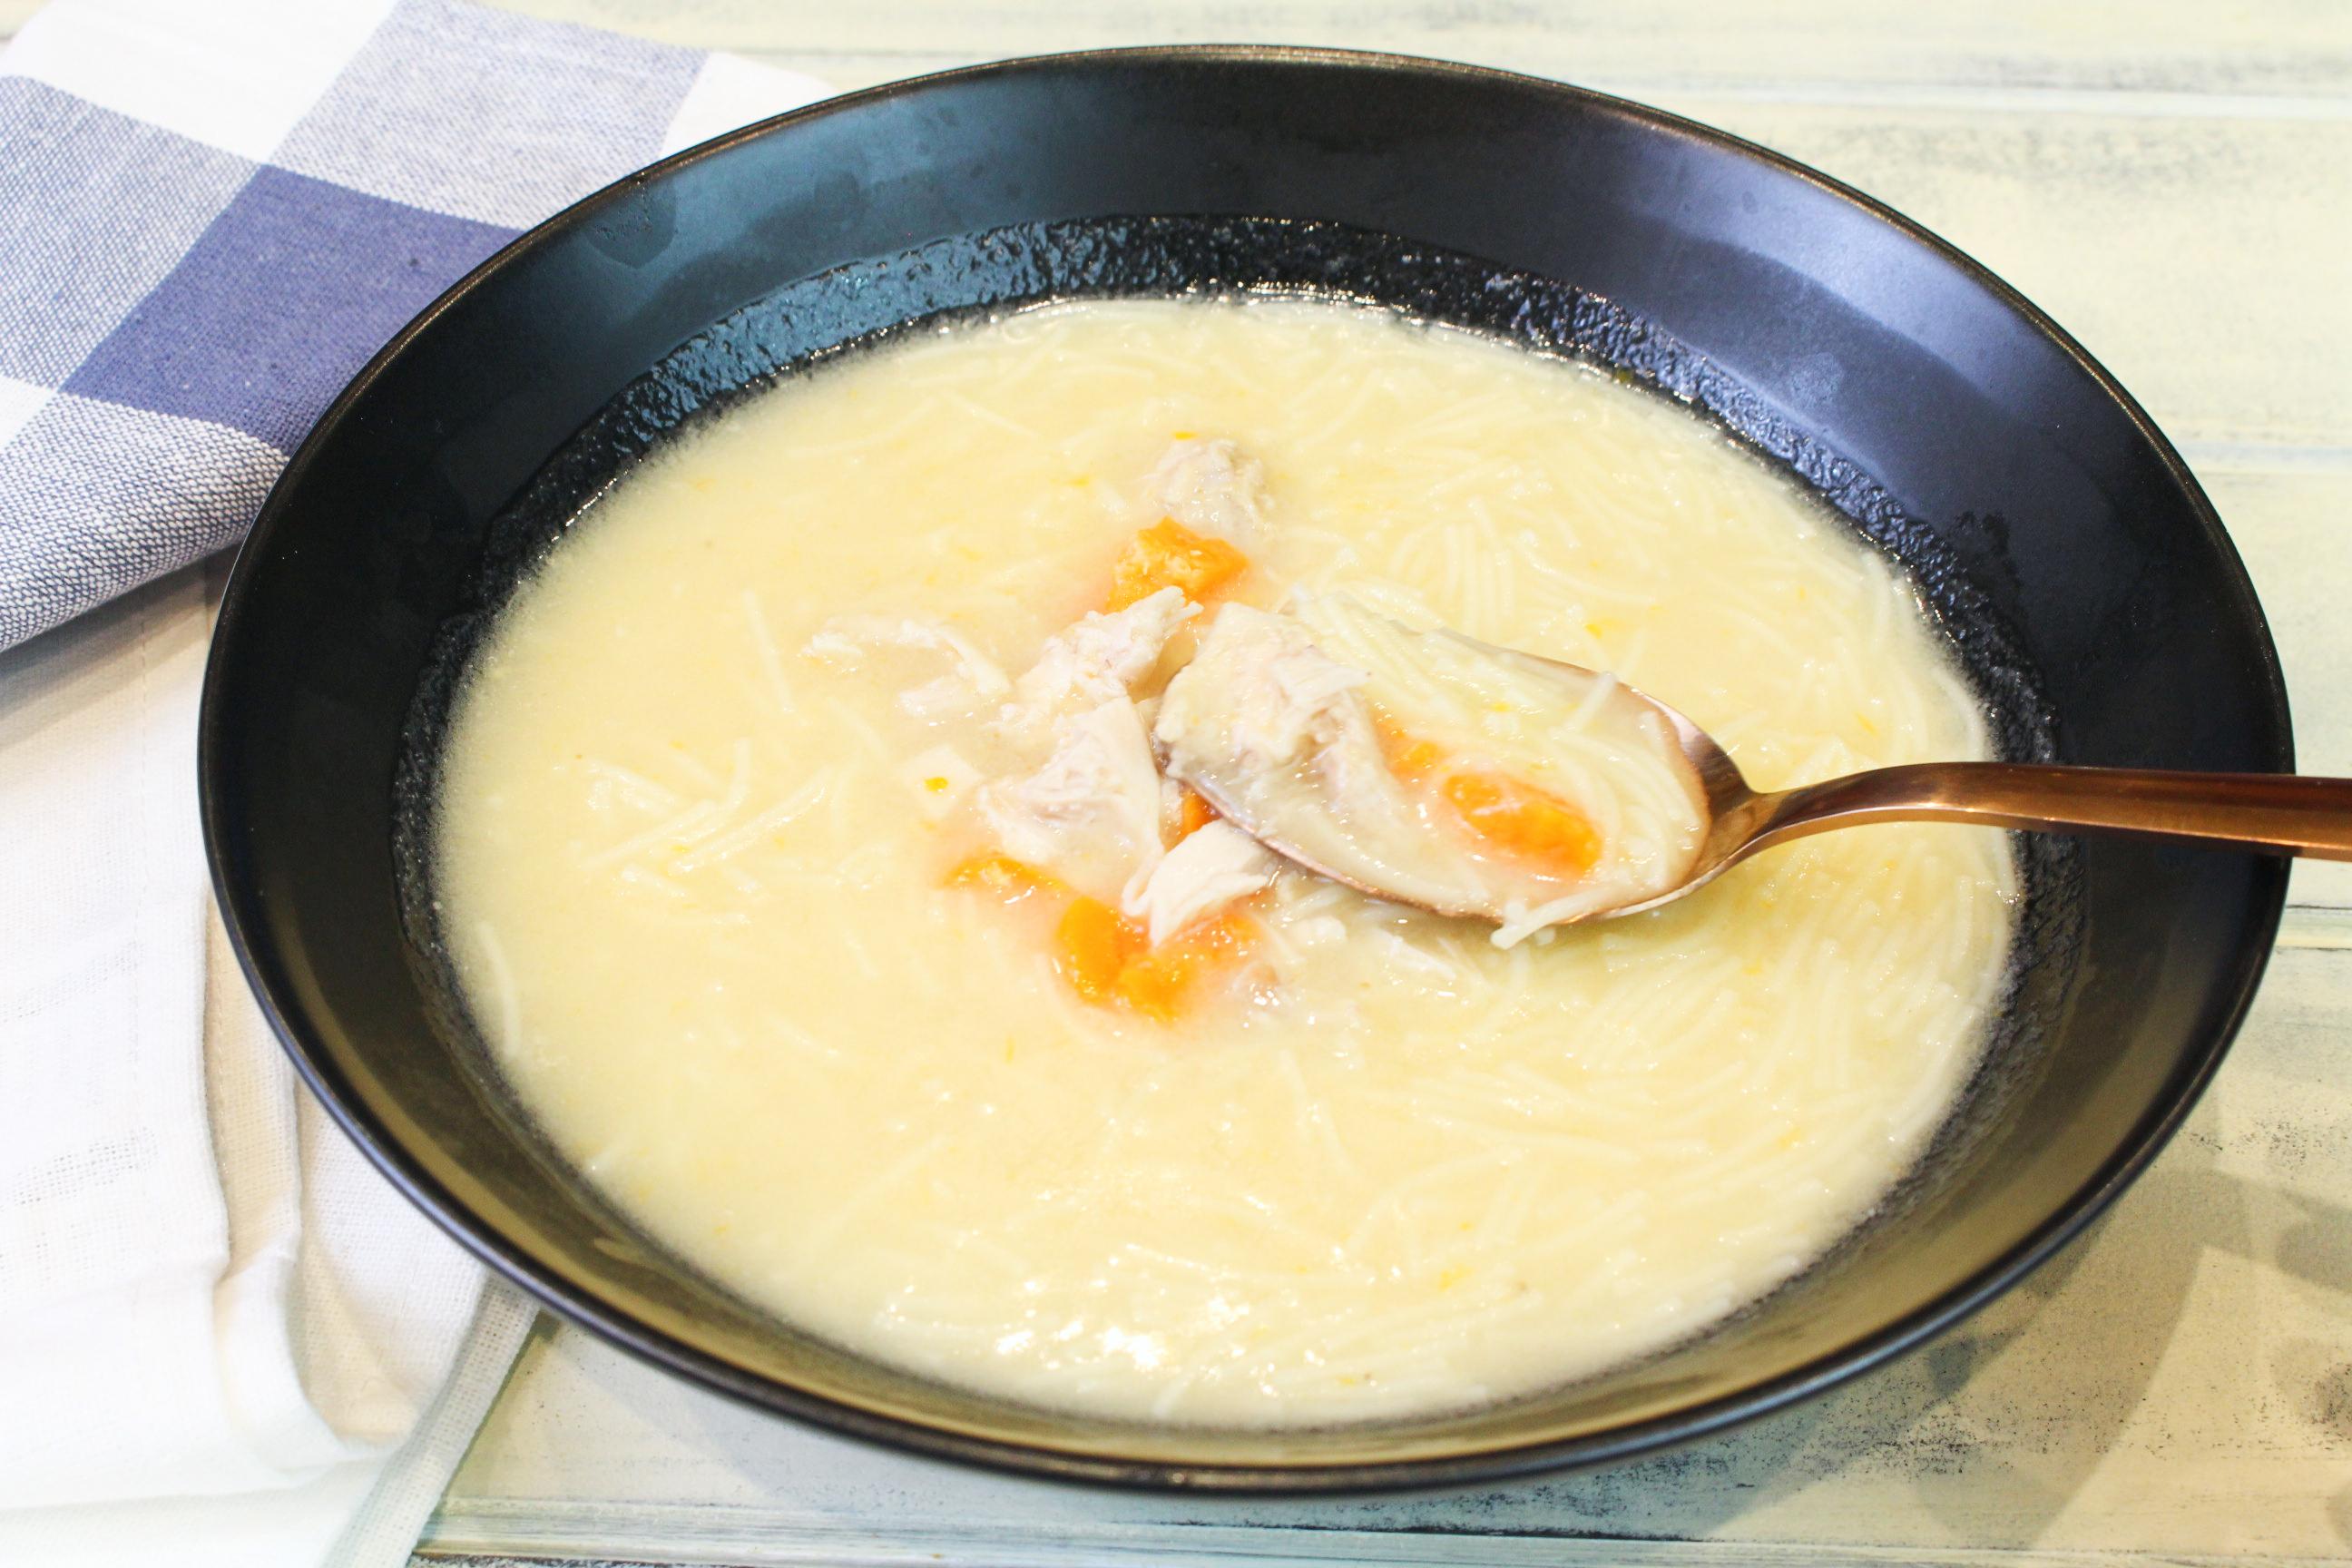 Receta de caldo rápido de sopa en Thermomix